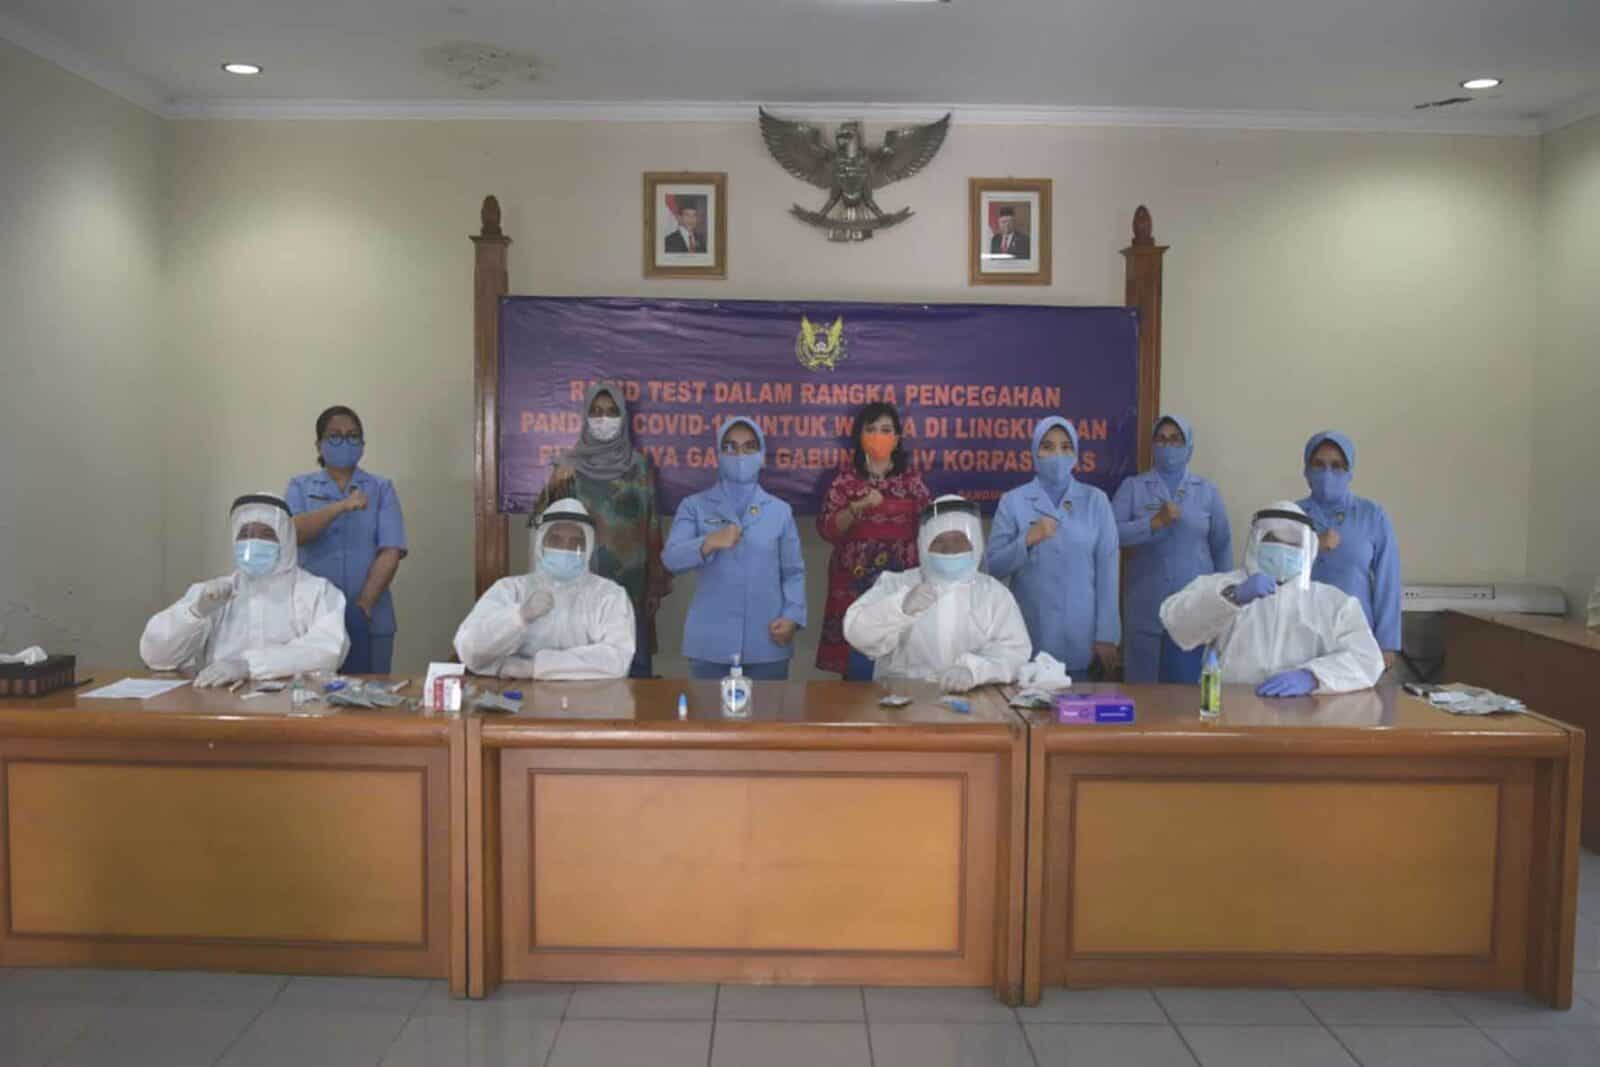 PIA Ardhya Garini Gabungan IV Korpaskhas Laksanakan Rapid test Cegah Covid-19